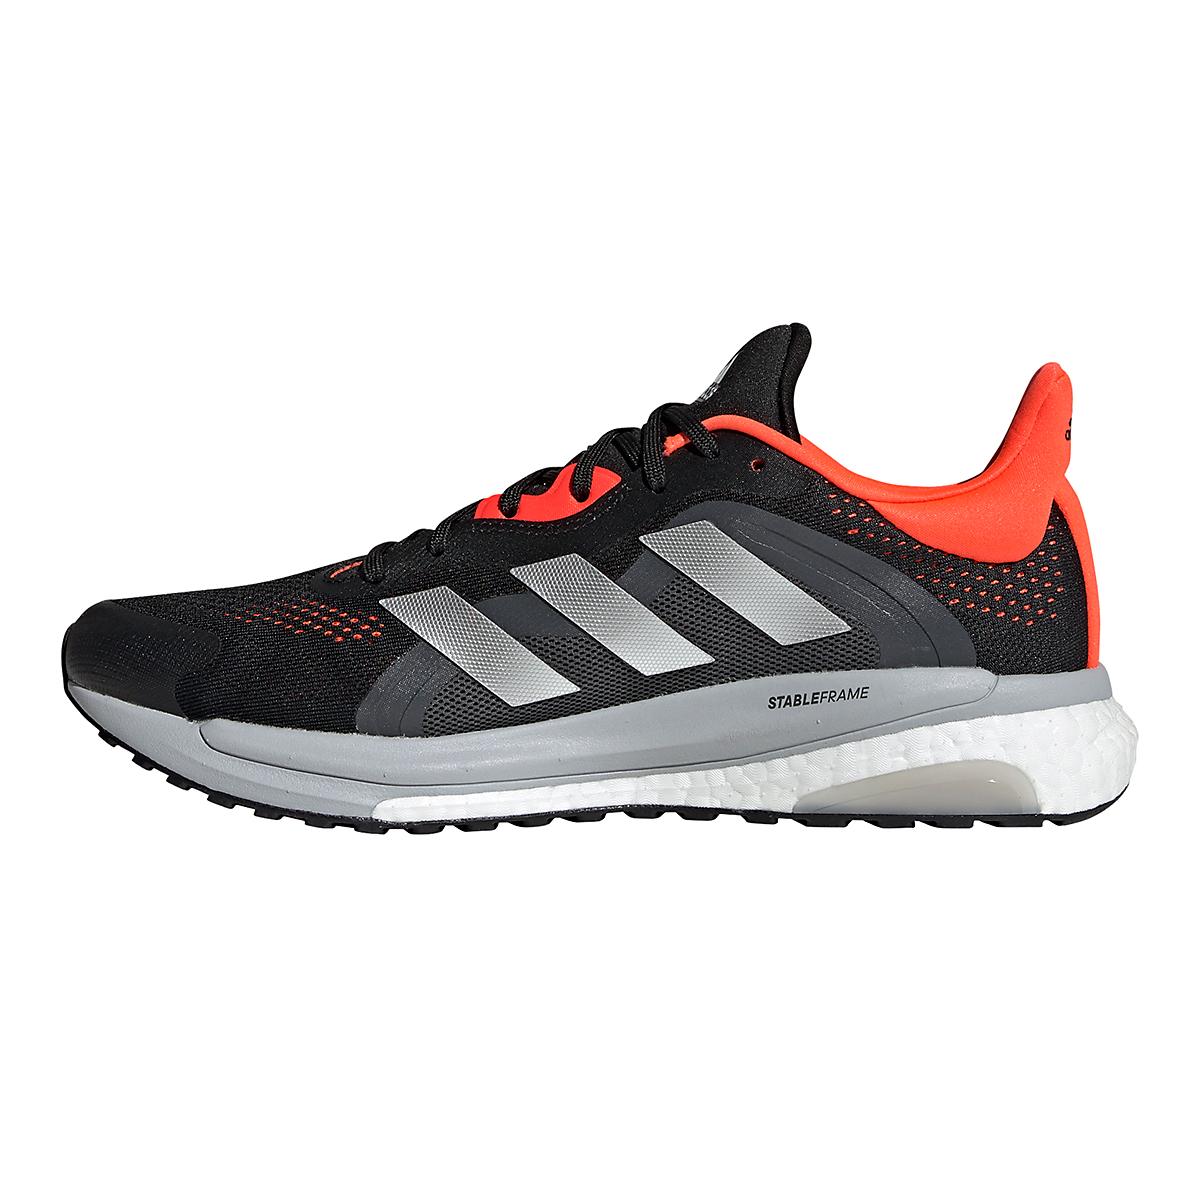 Men's Adidas Solar Glide 4 ST Running Shoe - Color: Core Black/Grey/Solar Red - Size: 6.5 - Width: Regular, Core Black/Grey/Solar Red, large, image 2